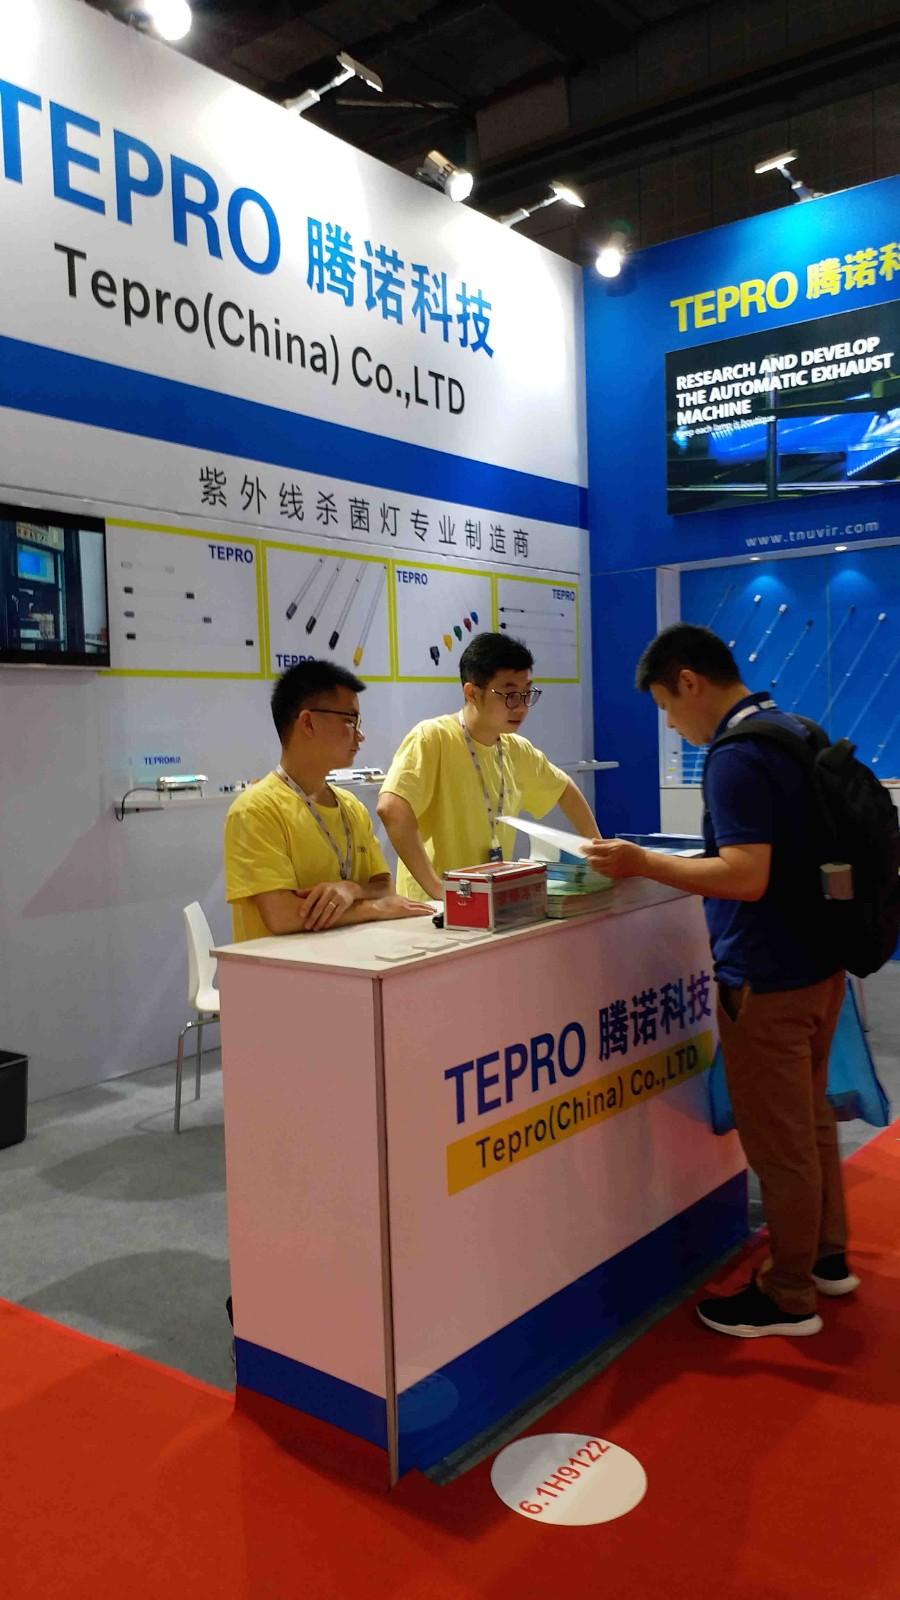 Tepro-Aquatech China Environment 2019 In Shanghai, Tepro china Co, Ltd-7